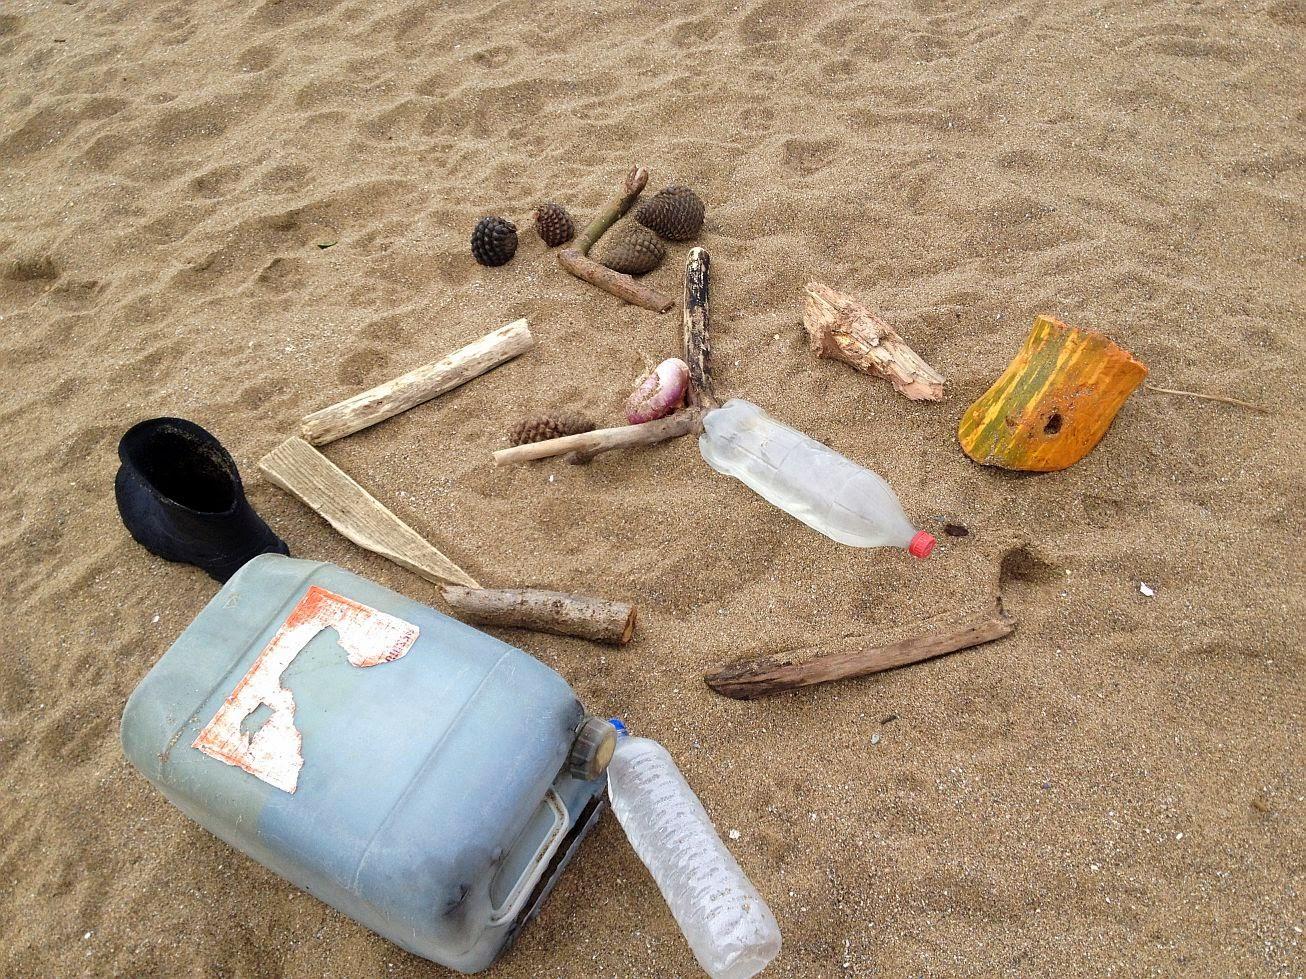 basura en la playa 03